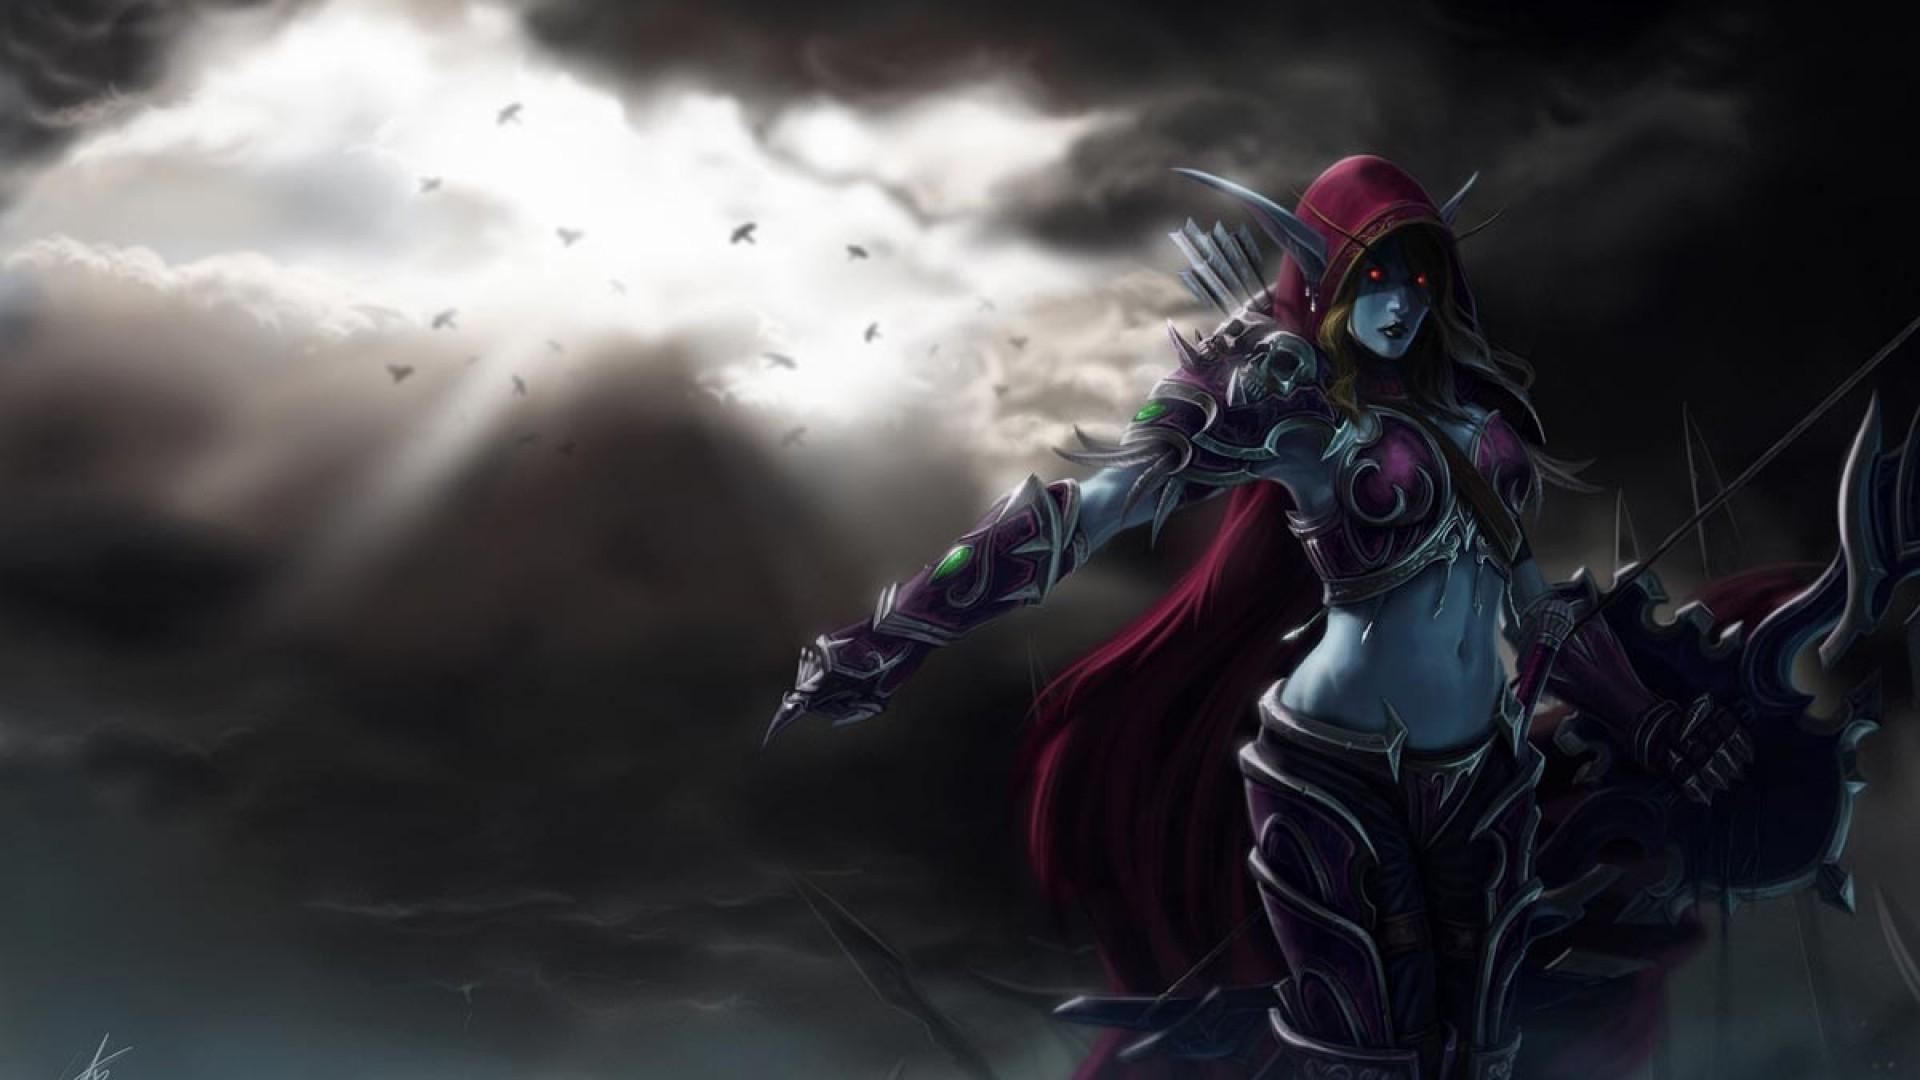 Res: 1920x1080, Encantador Valla Wow #3 - Steam Community Sylvanas Windrunner World Of  Warcraft